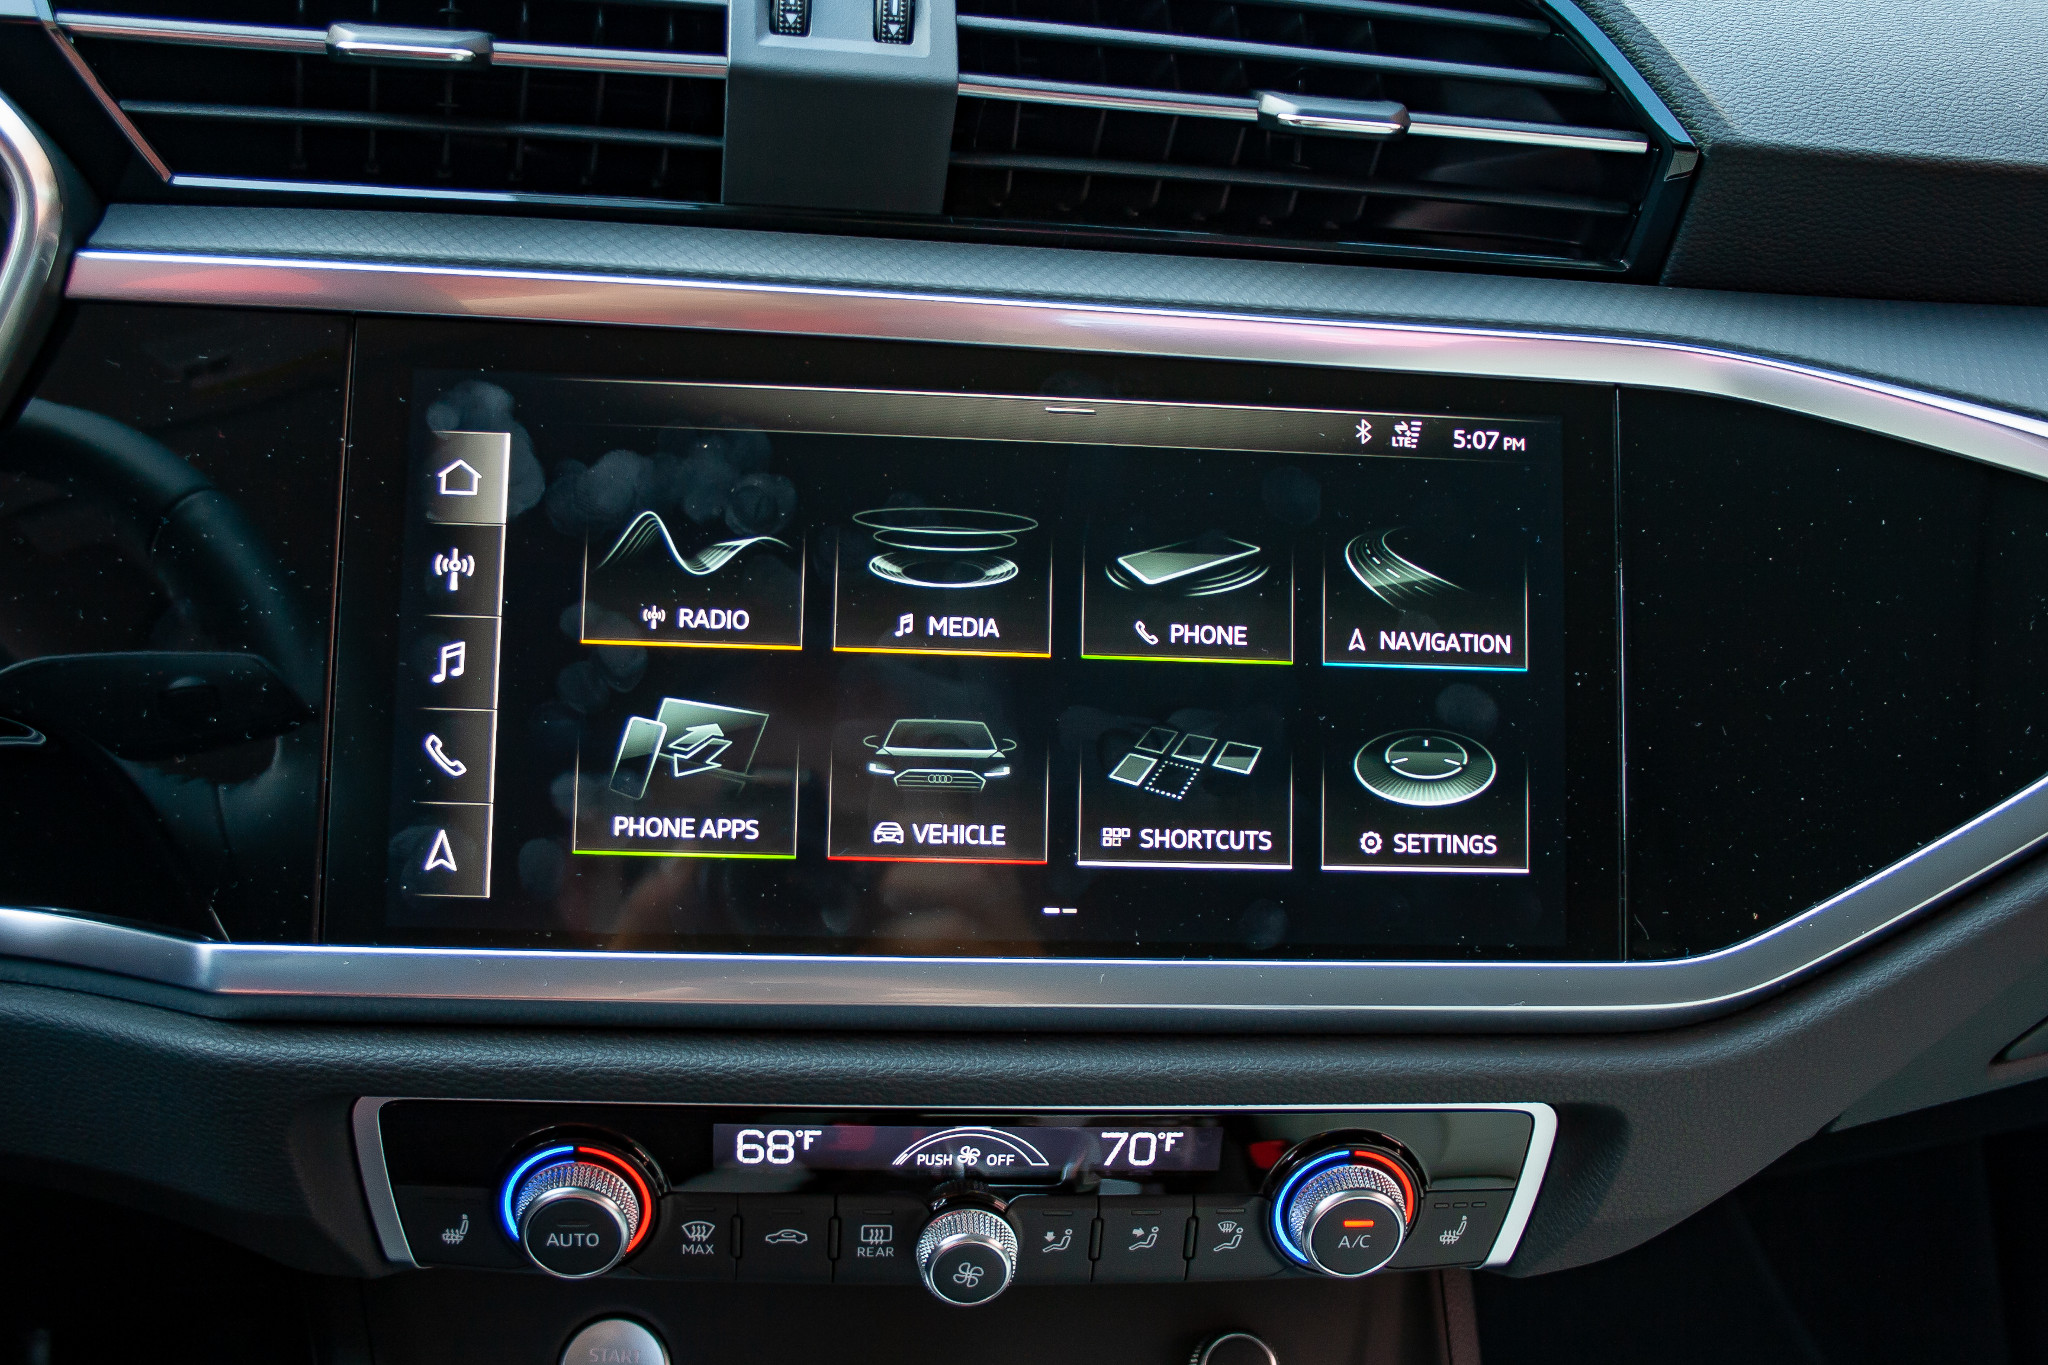 audi-q3-2019-16-center-stack-display--front-row--interior.jpg